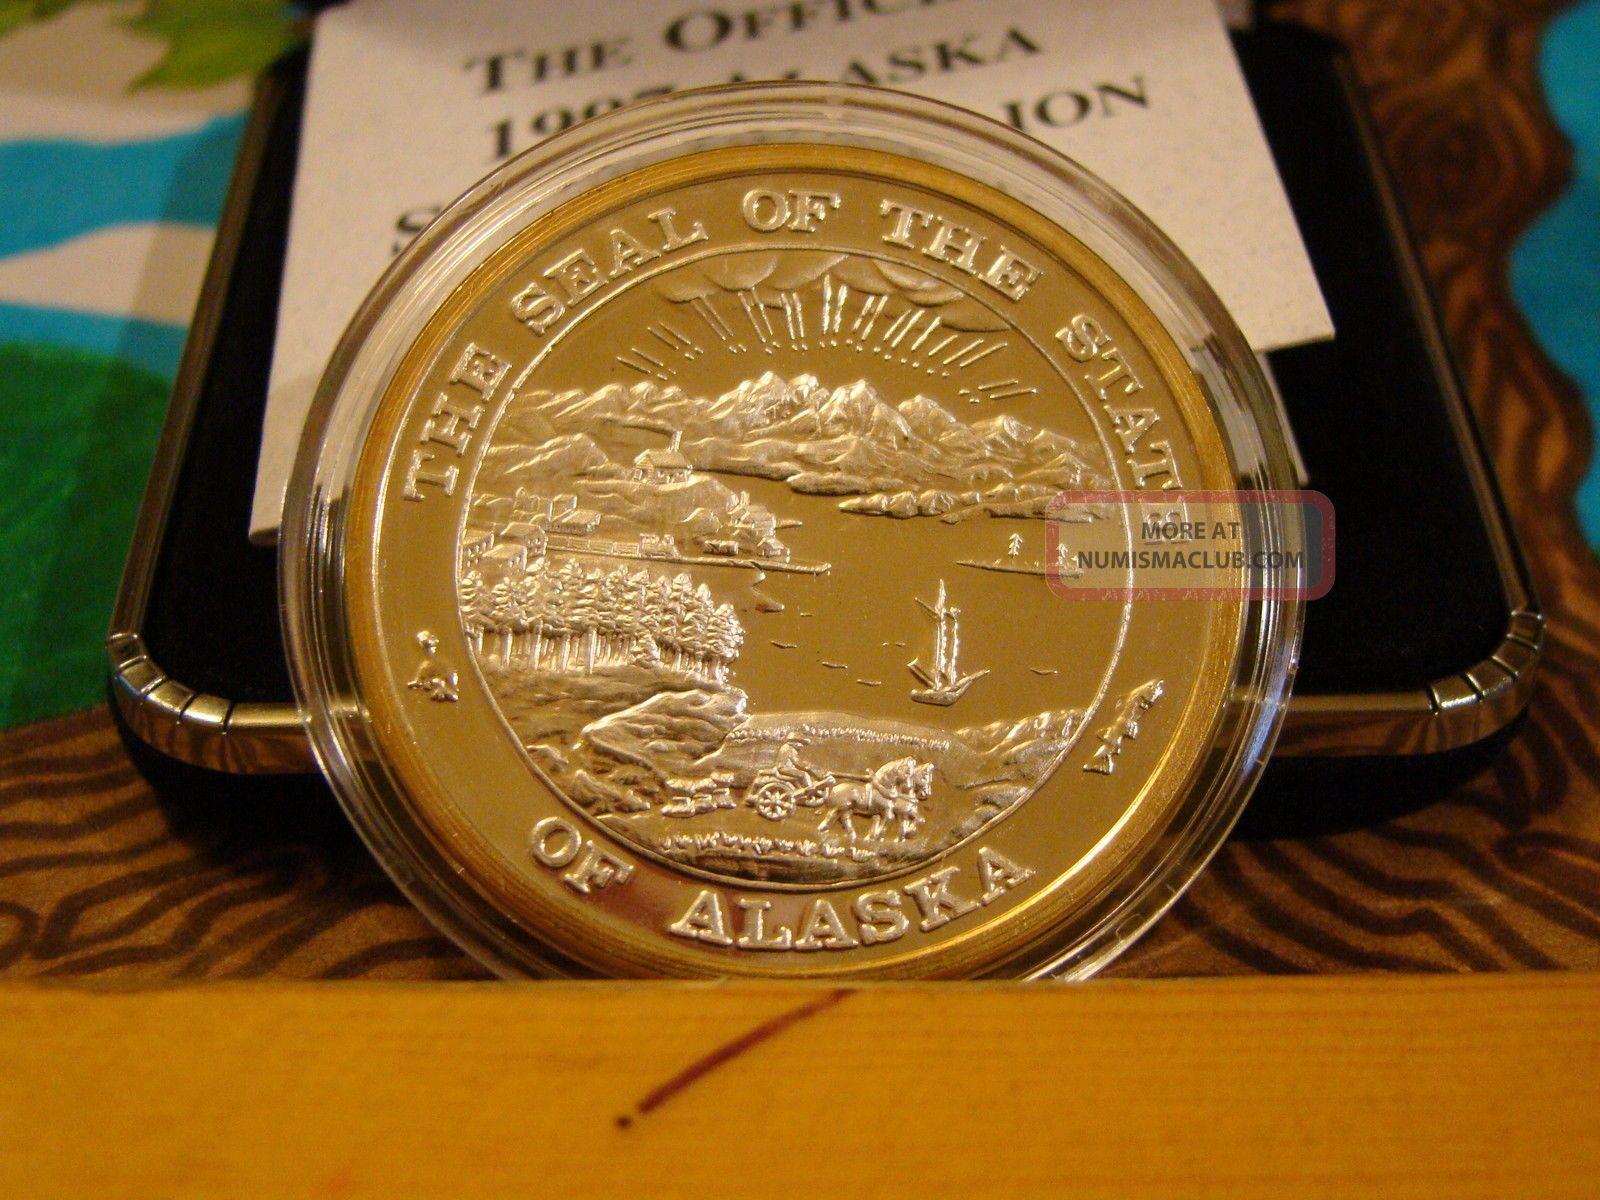 Alaska 1997 Musk Ox Proof Official State Medallion 999